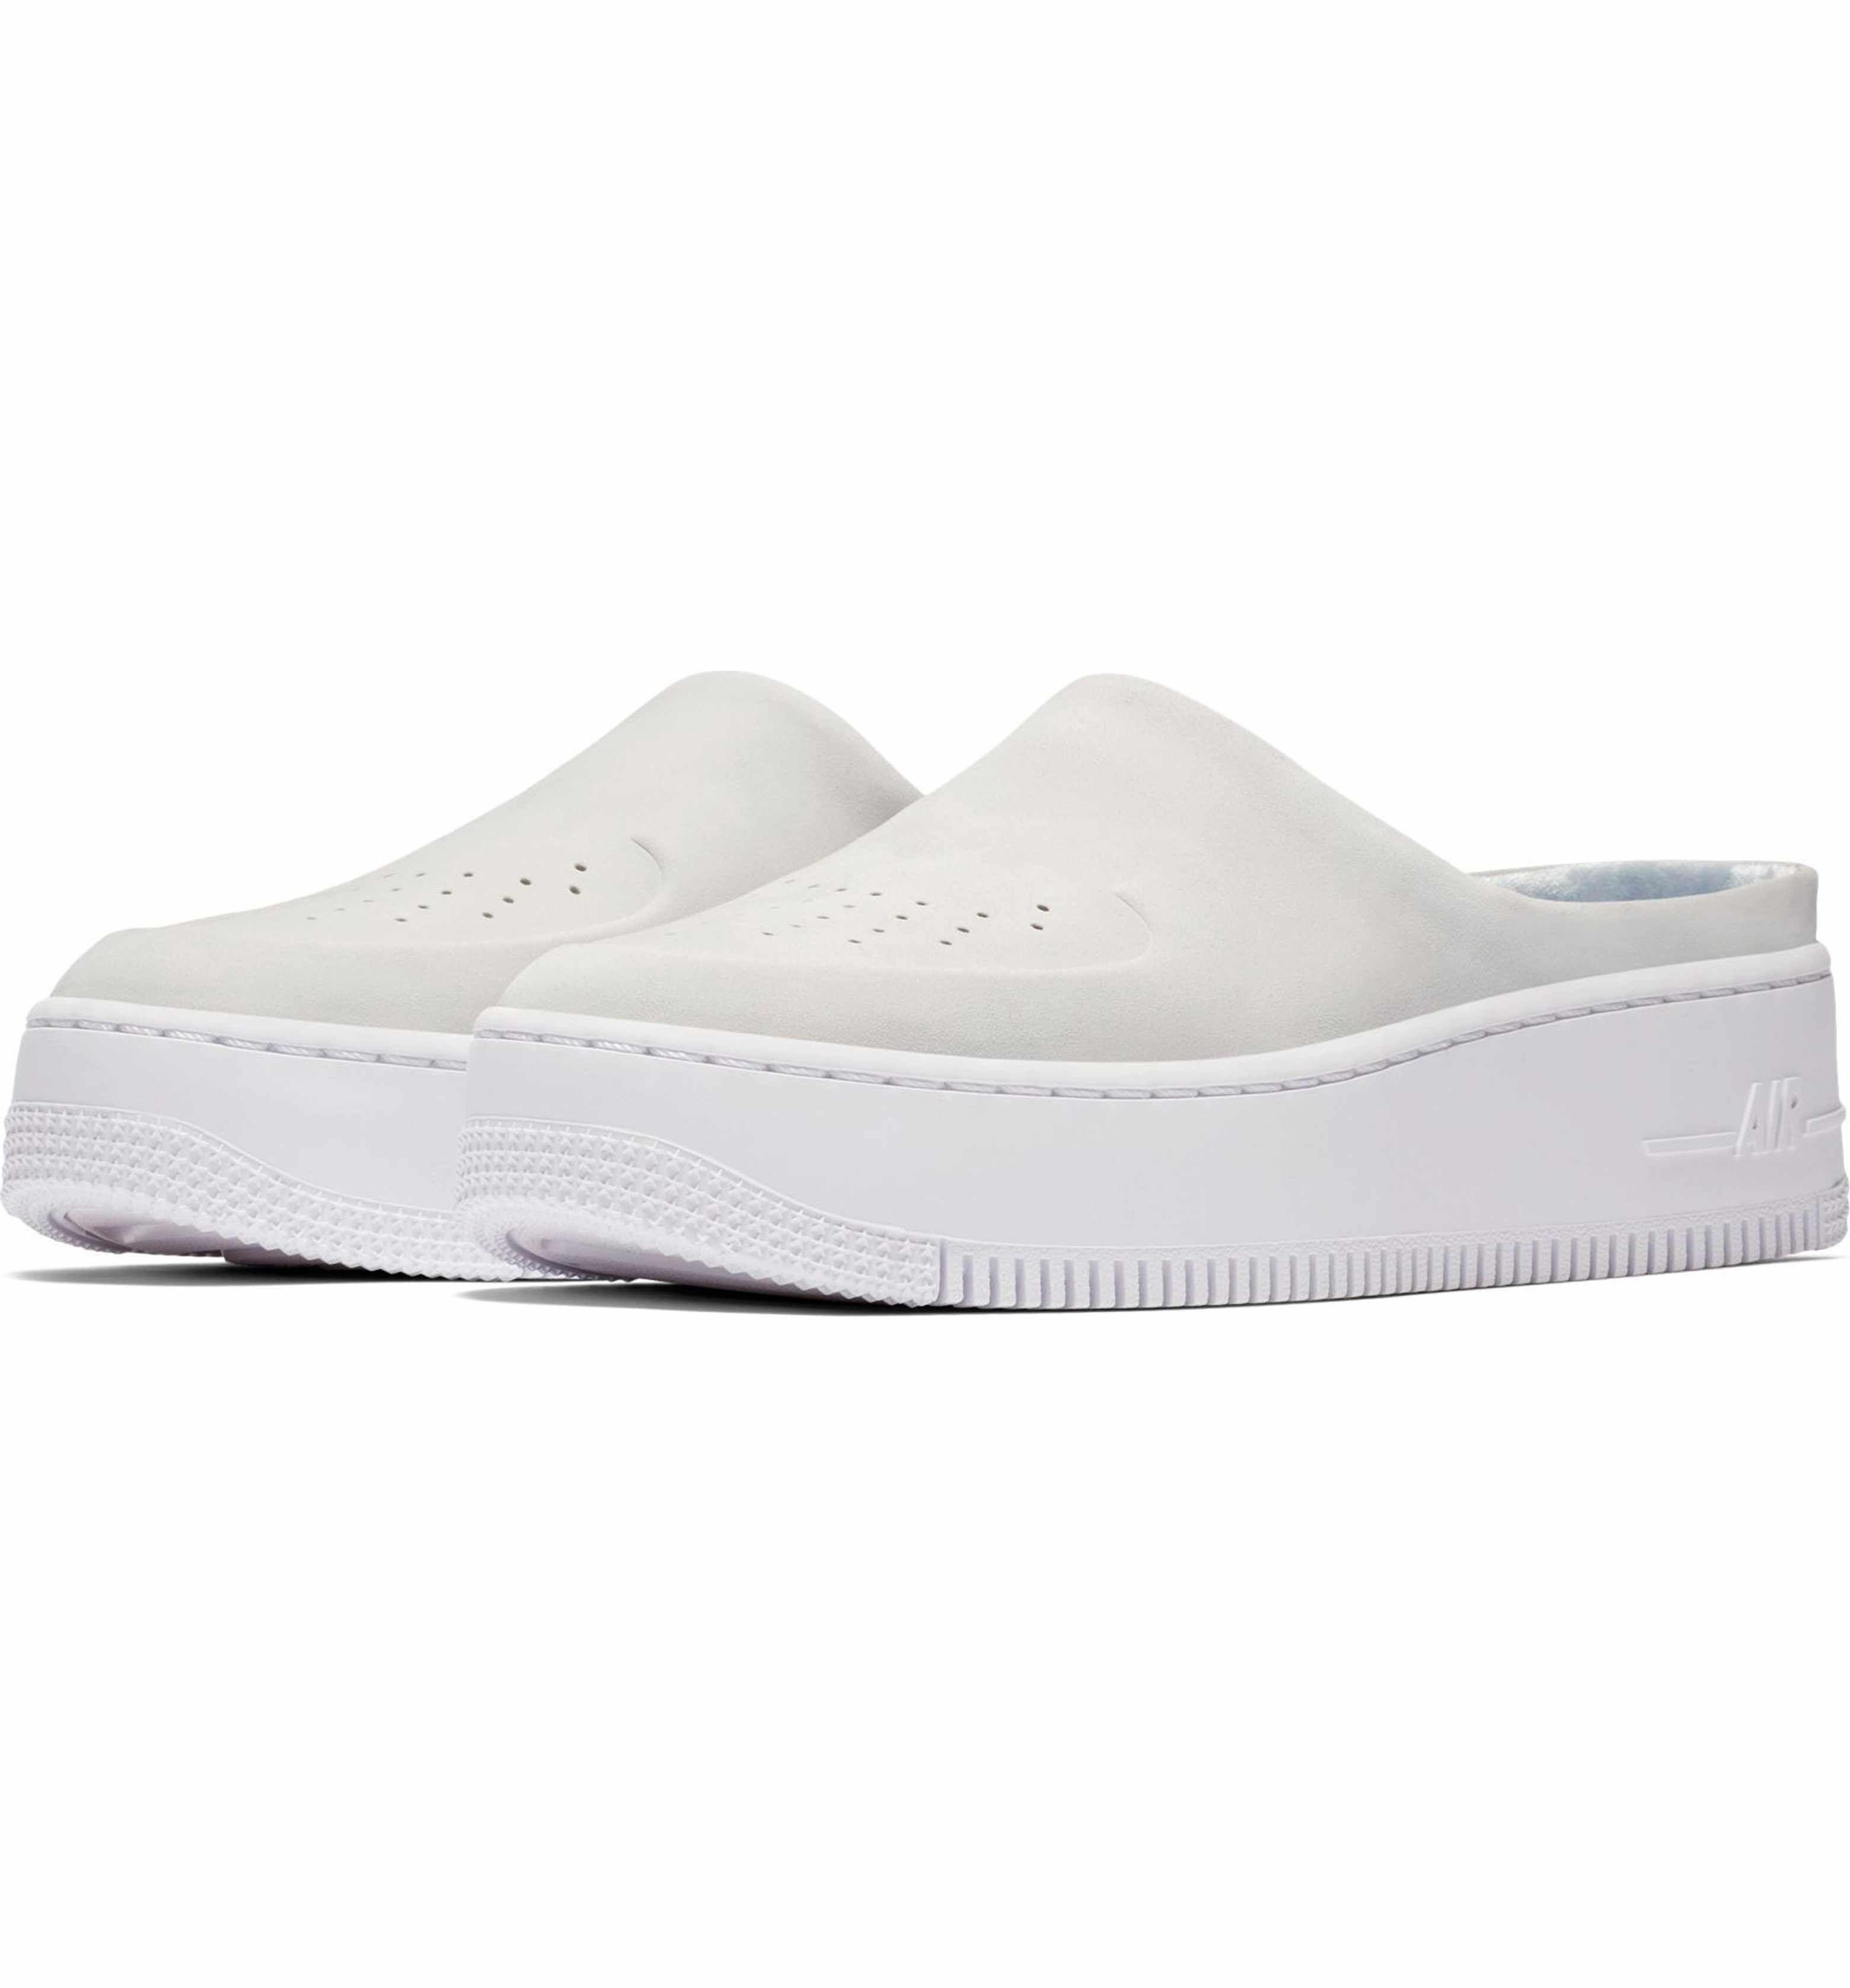 f97830414a9 Main Image - Nike Air Force 1 Lover XX Slip-On Mule Sneaker (Women ...